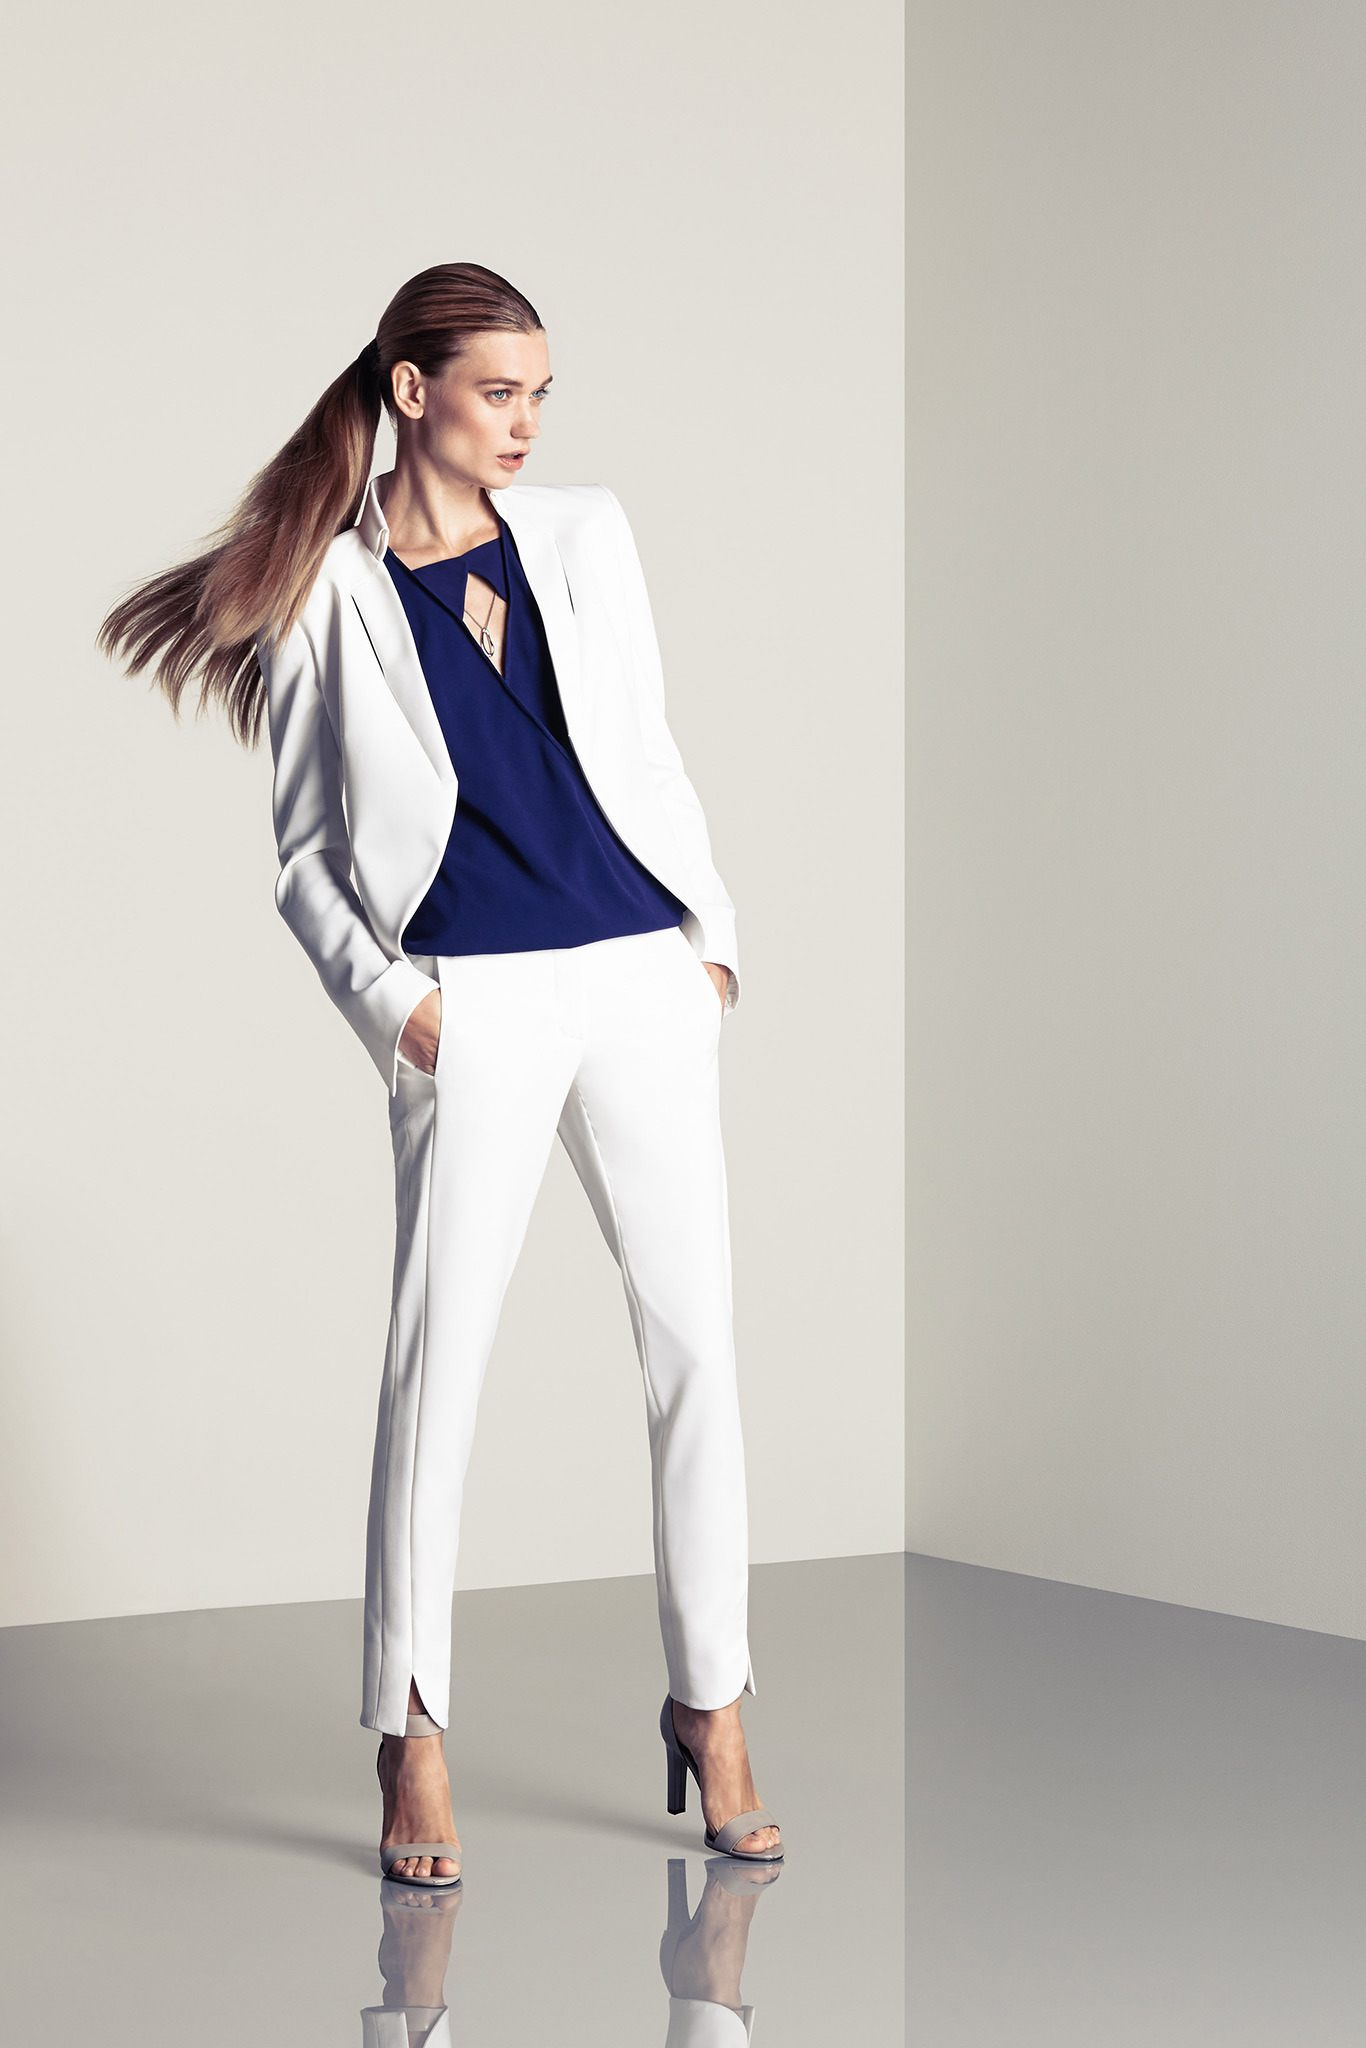 Tuxedo fashion trends 2018 100